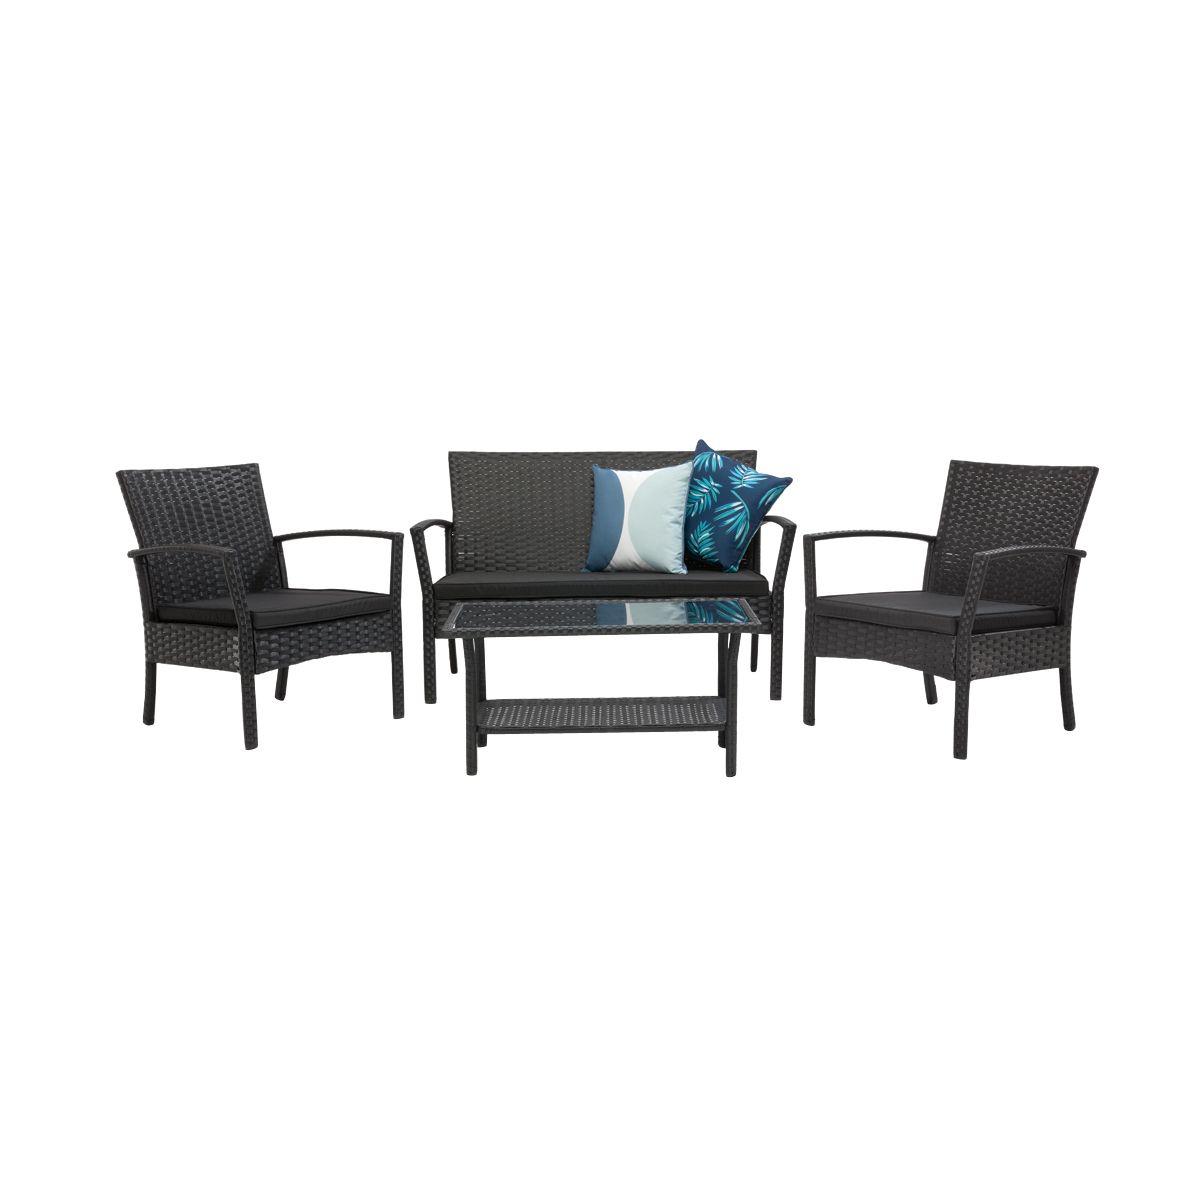 sofa slipcovers kmart australia stanton next 4 piece wicker conversation set outdoor pinterest